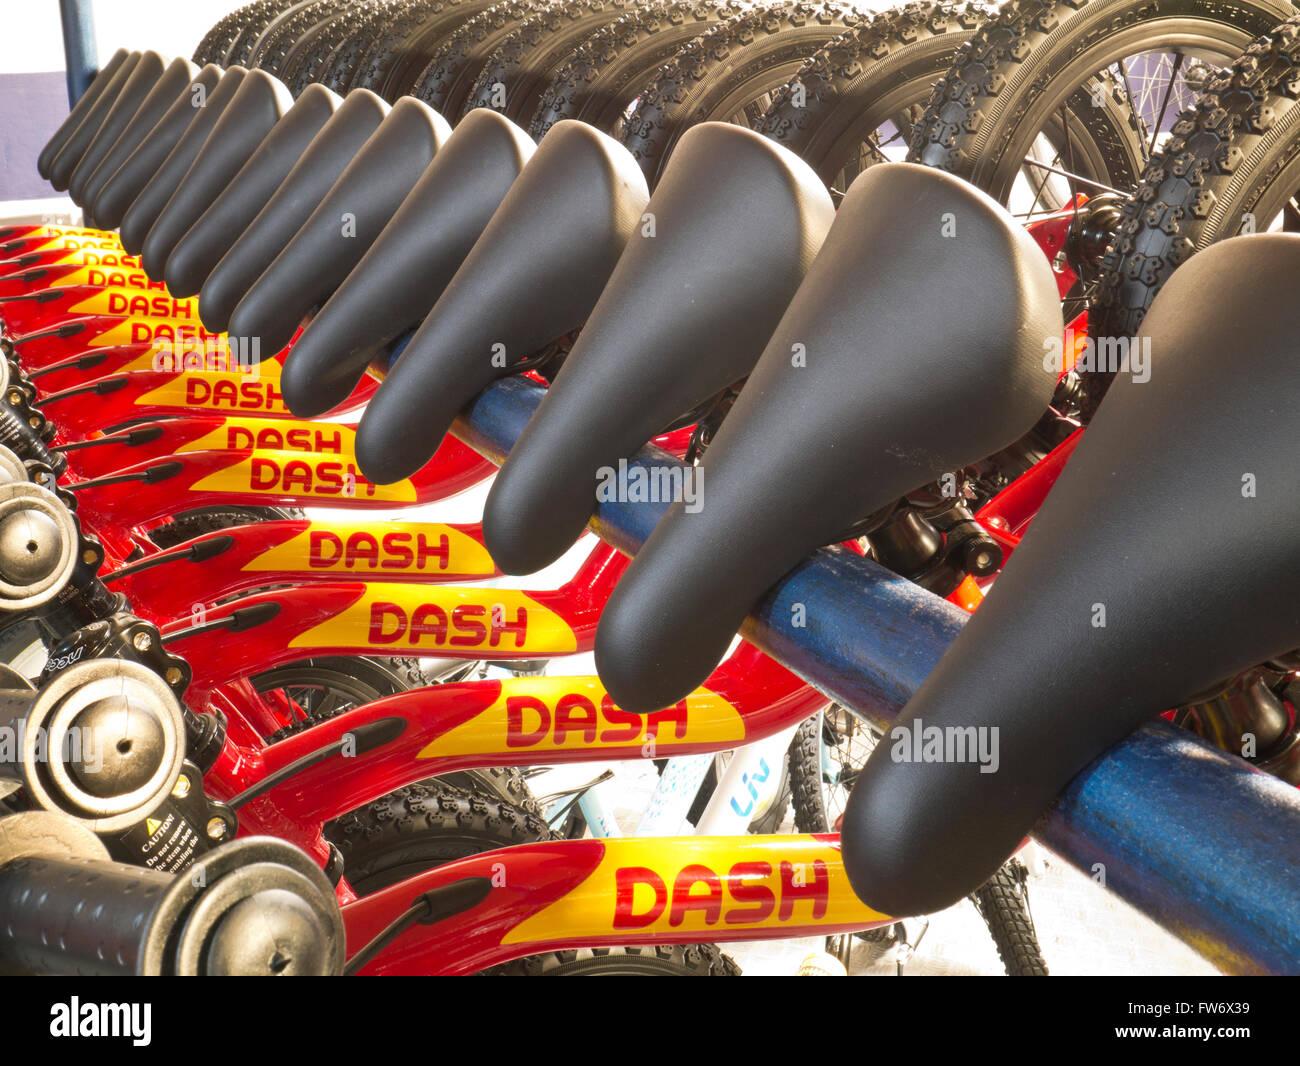 Balance bikes Imagen De Stock